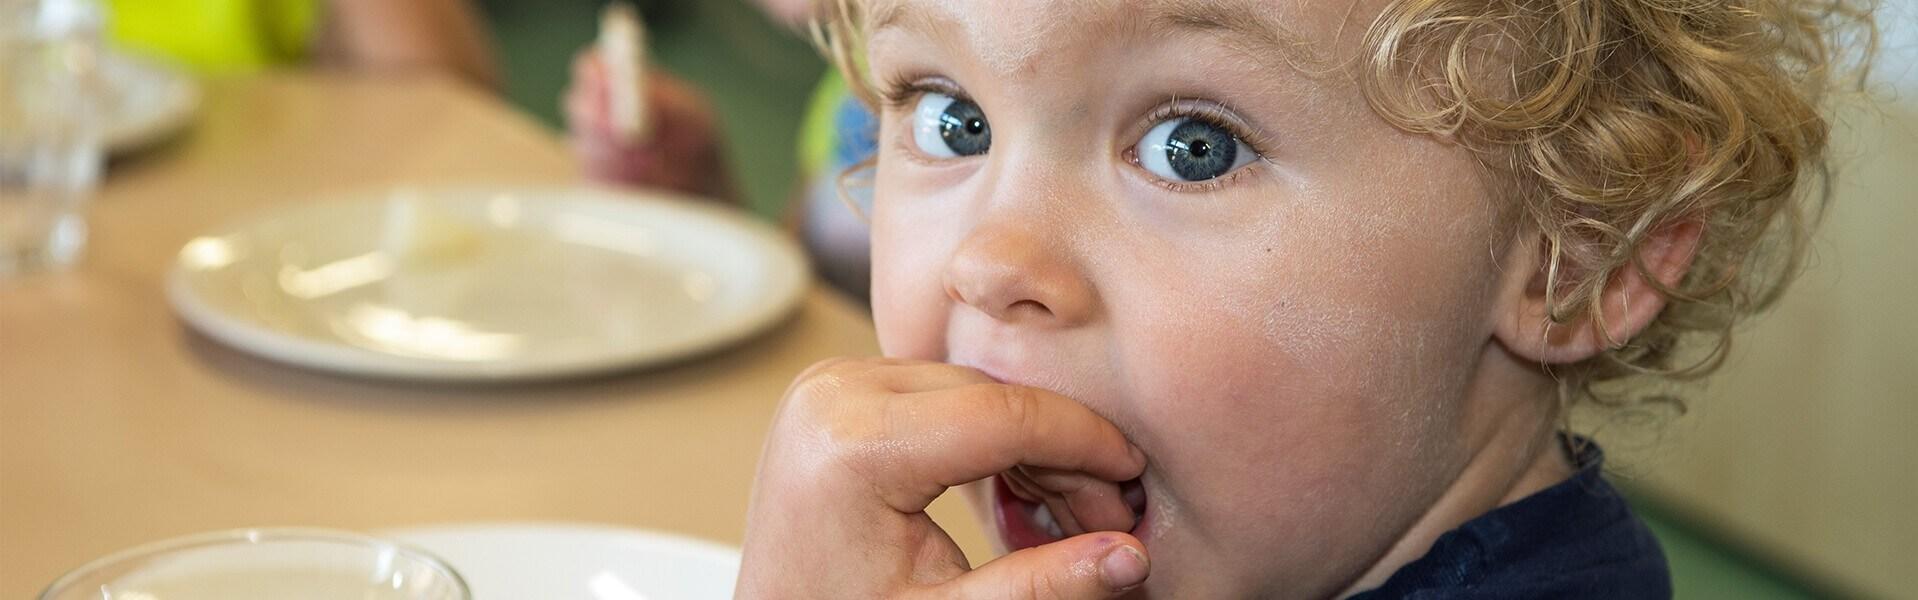 Rhydyfelin Day Nursery Child care